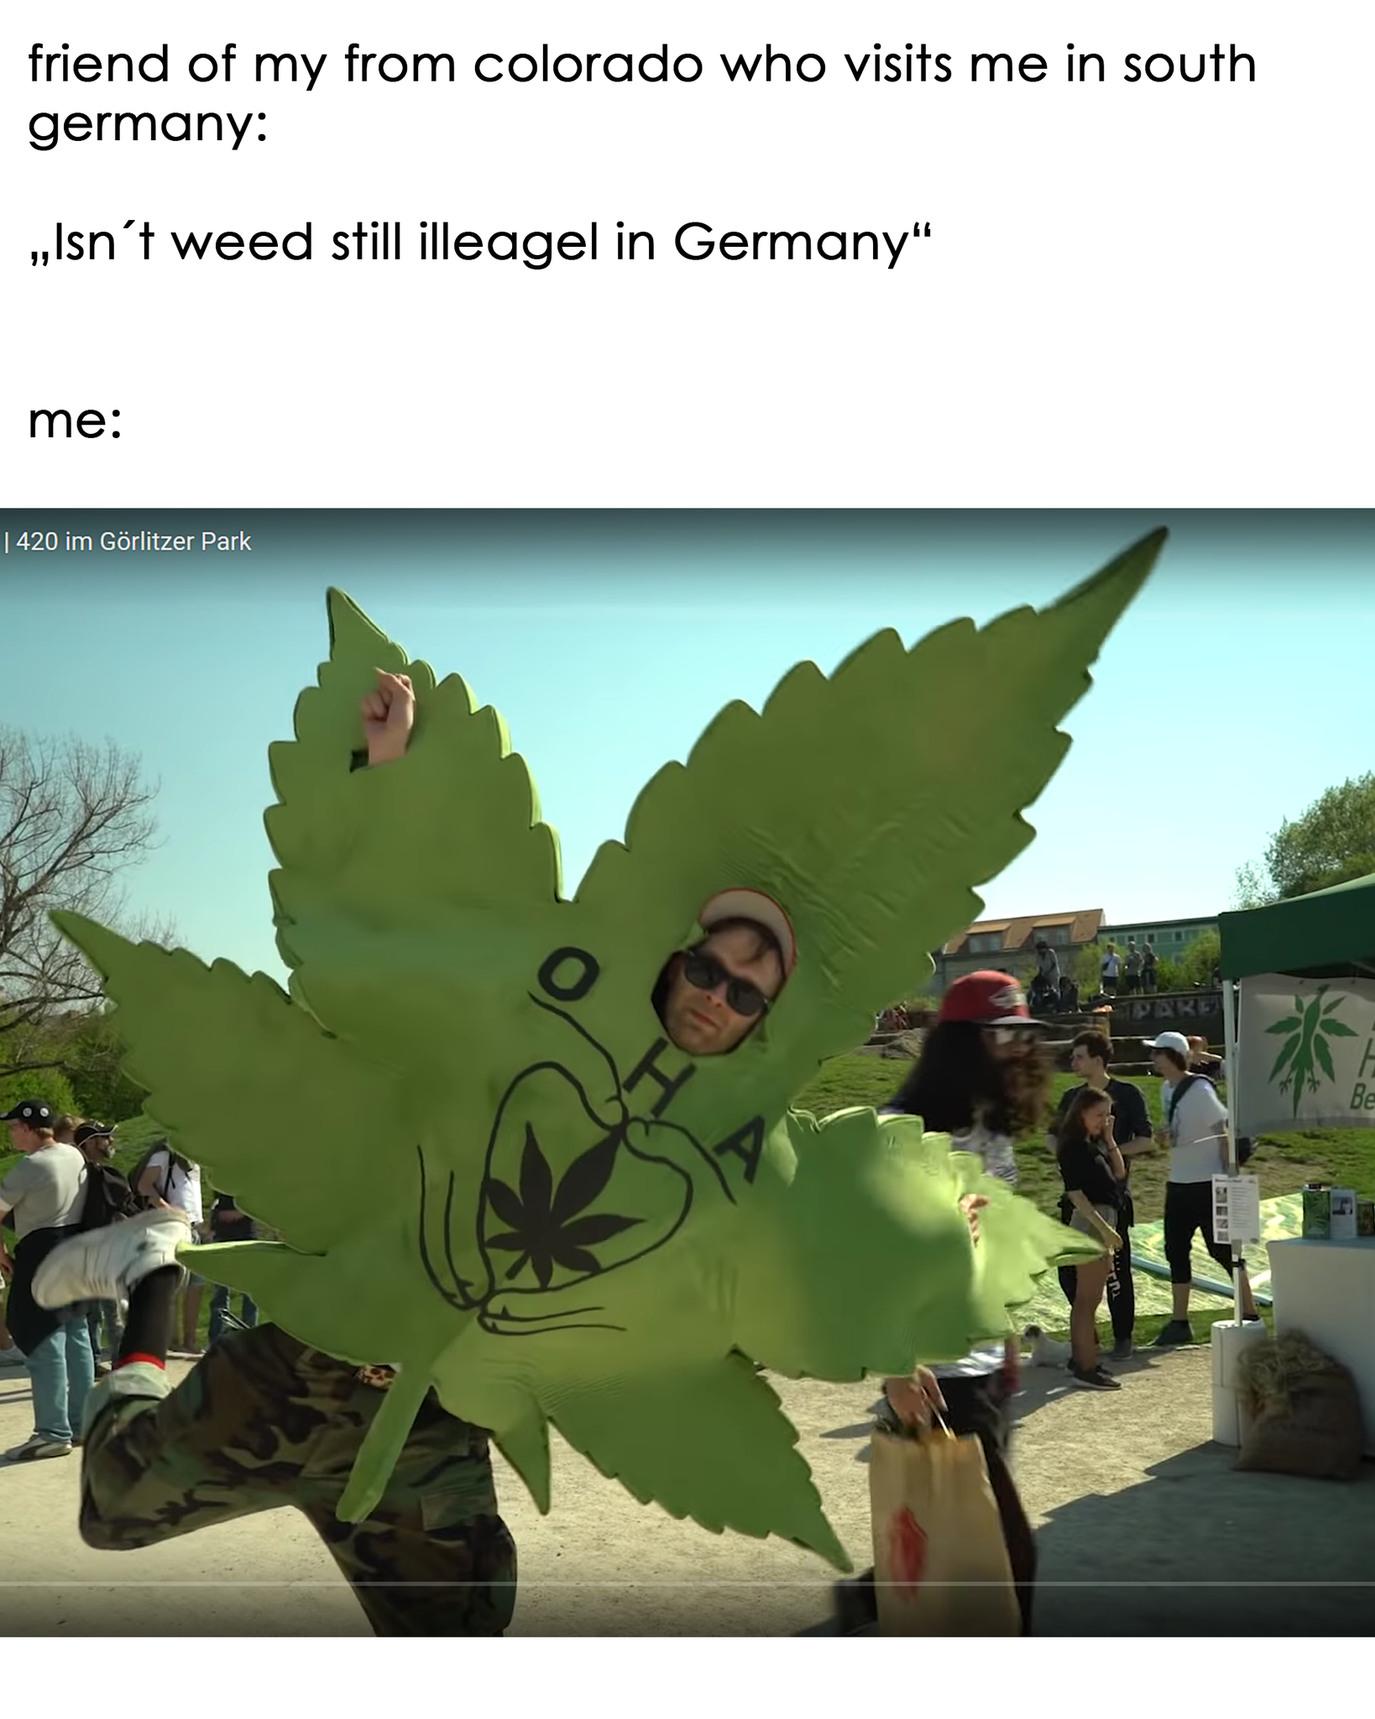 High since 4/20 - meme